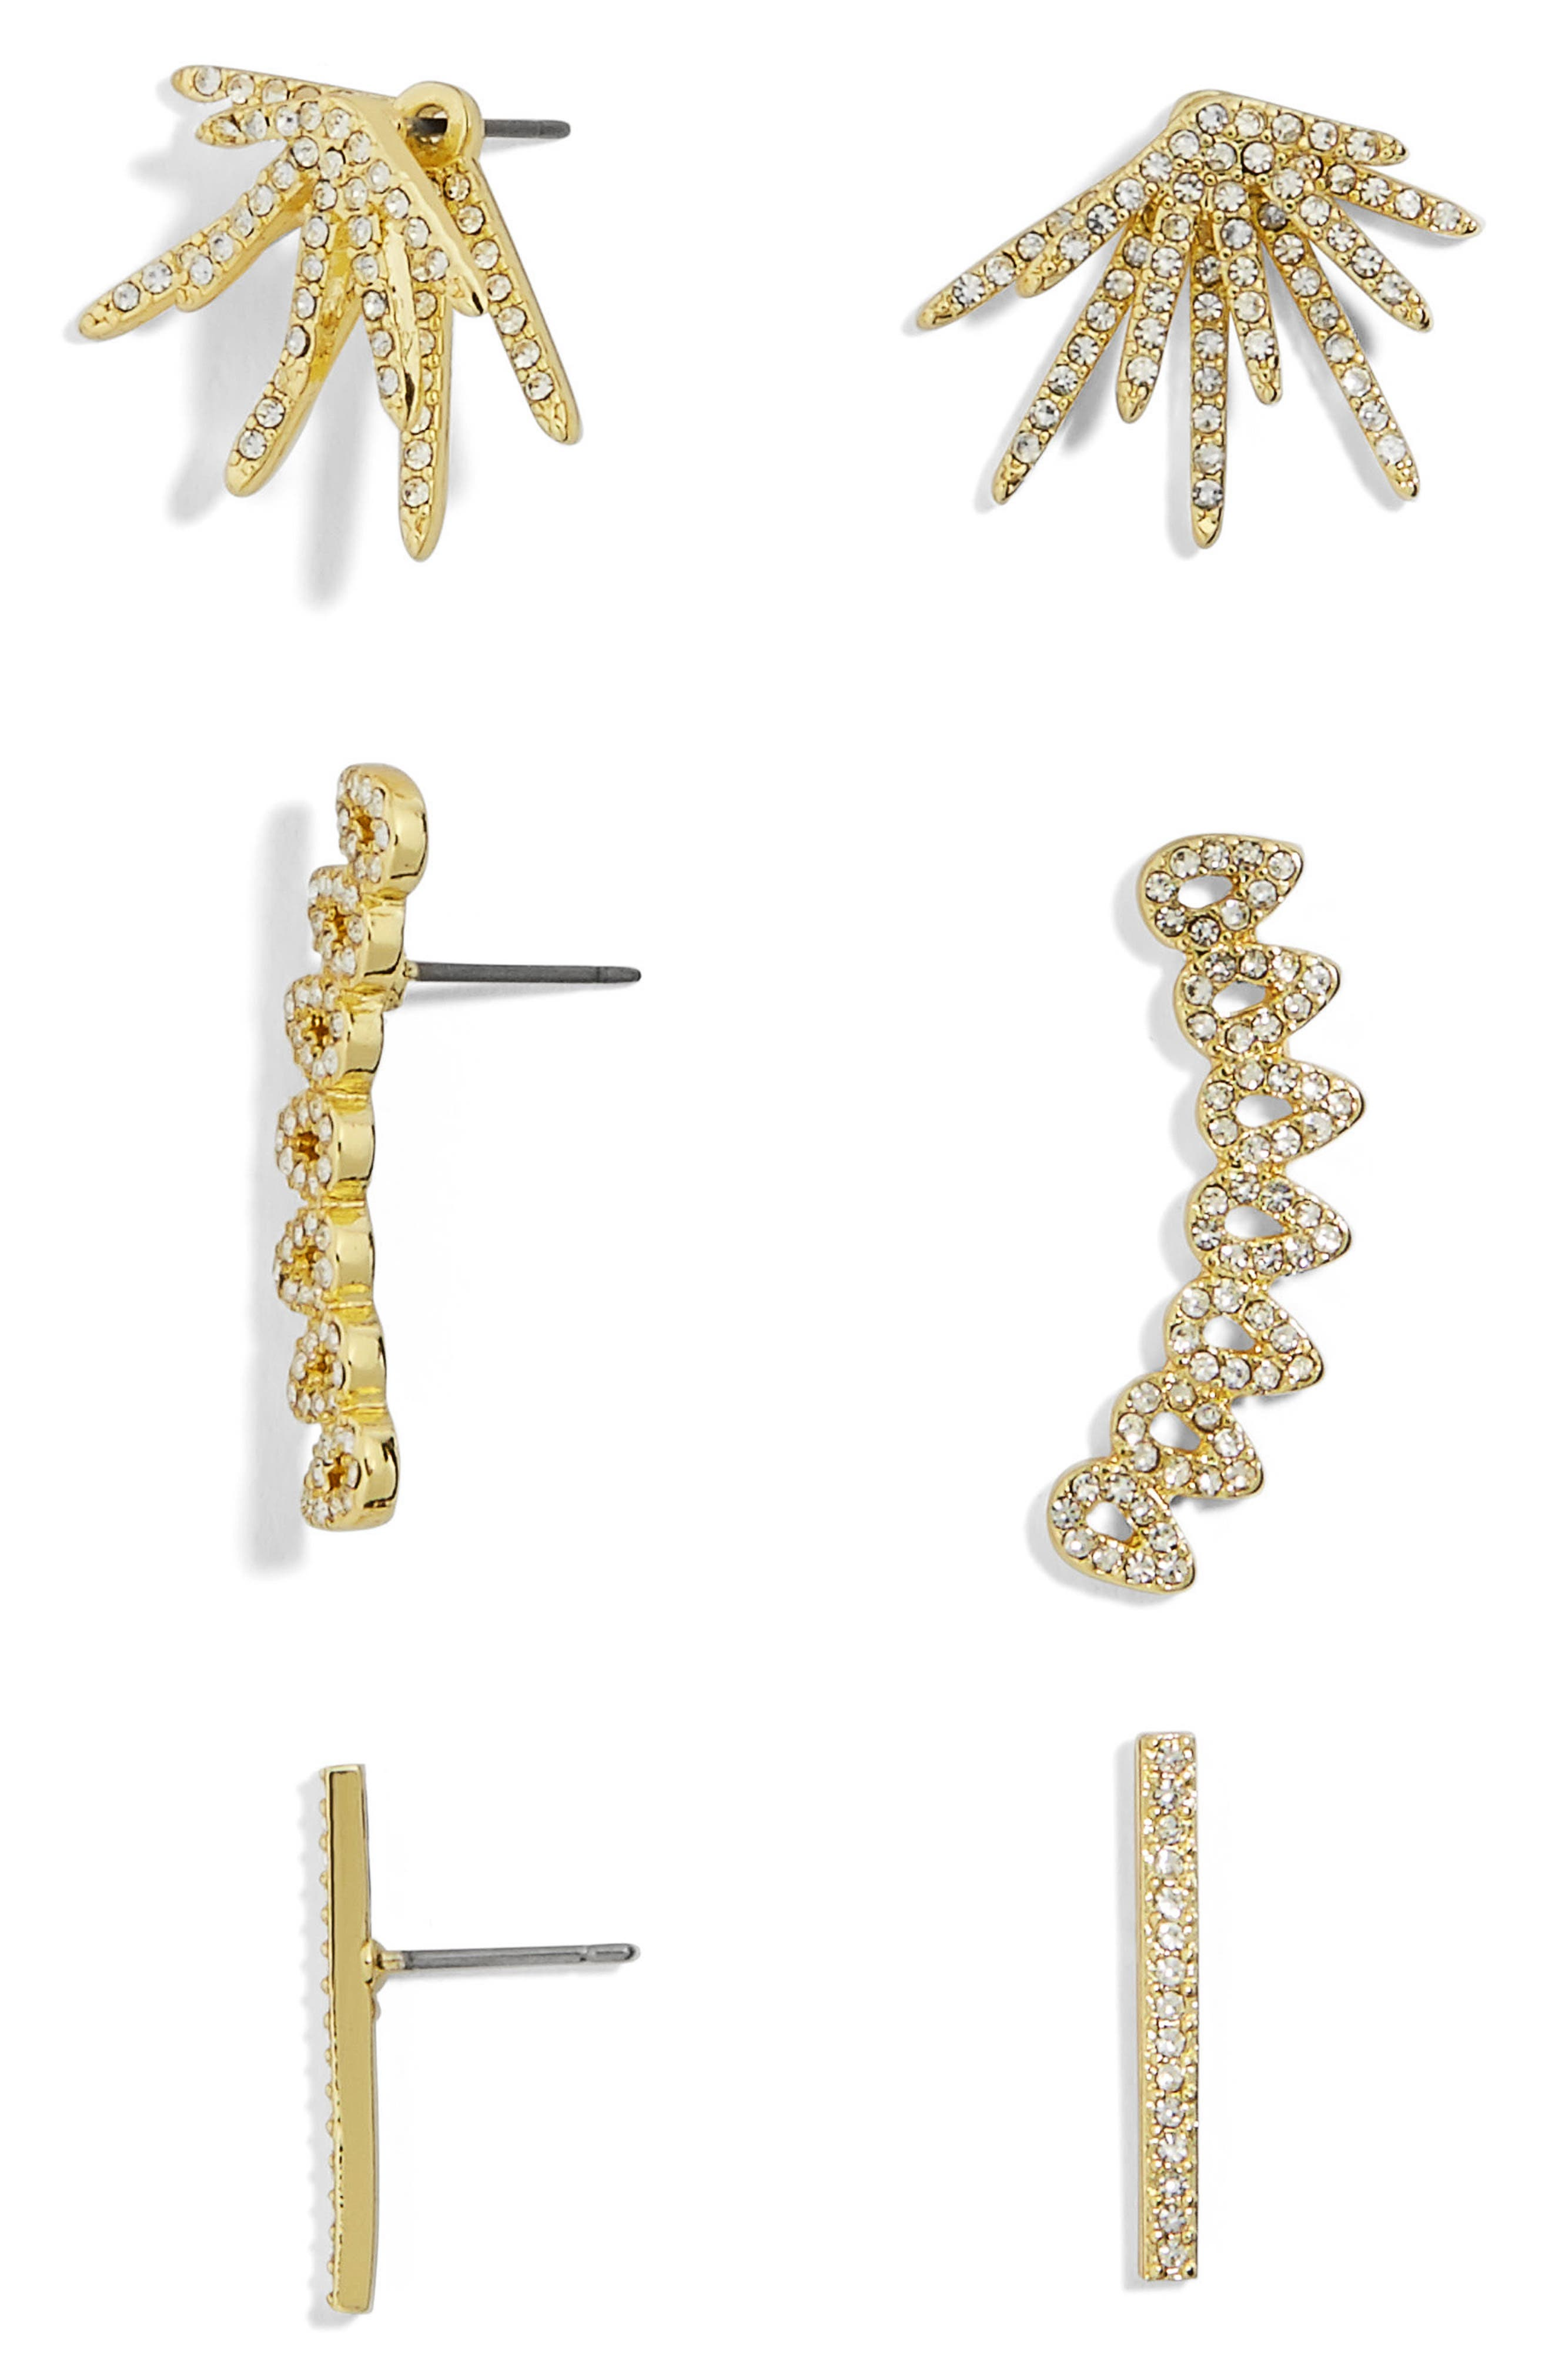 BAUBLEBAR, Cesa Trio Earrings Set, Main thumbnail 1, color, 710